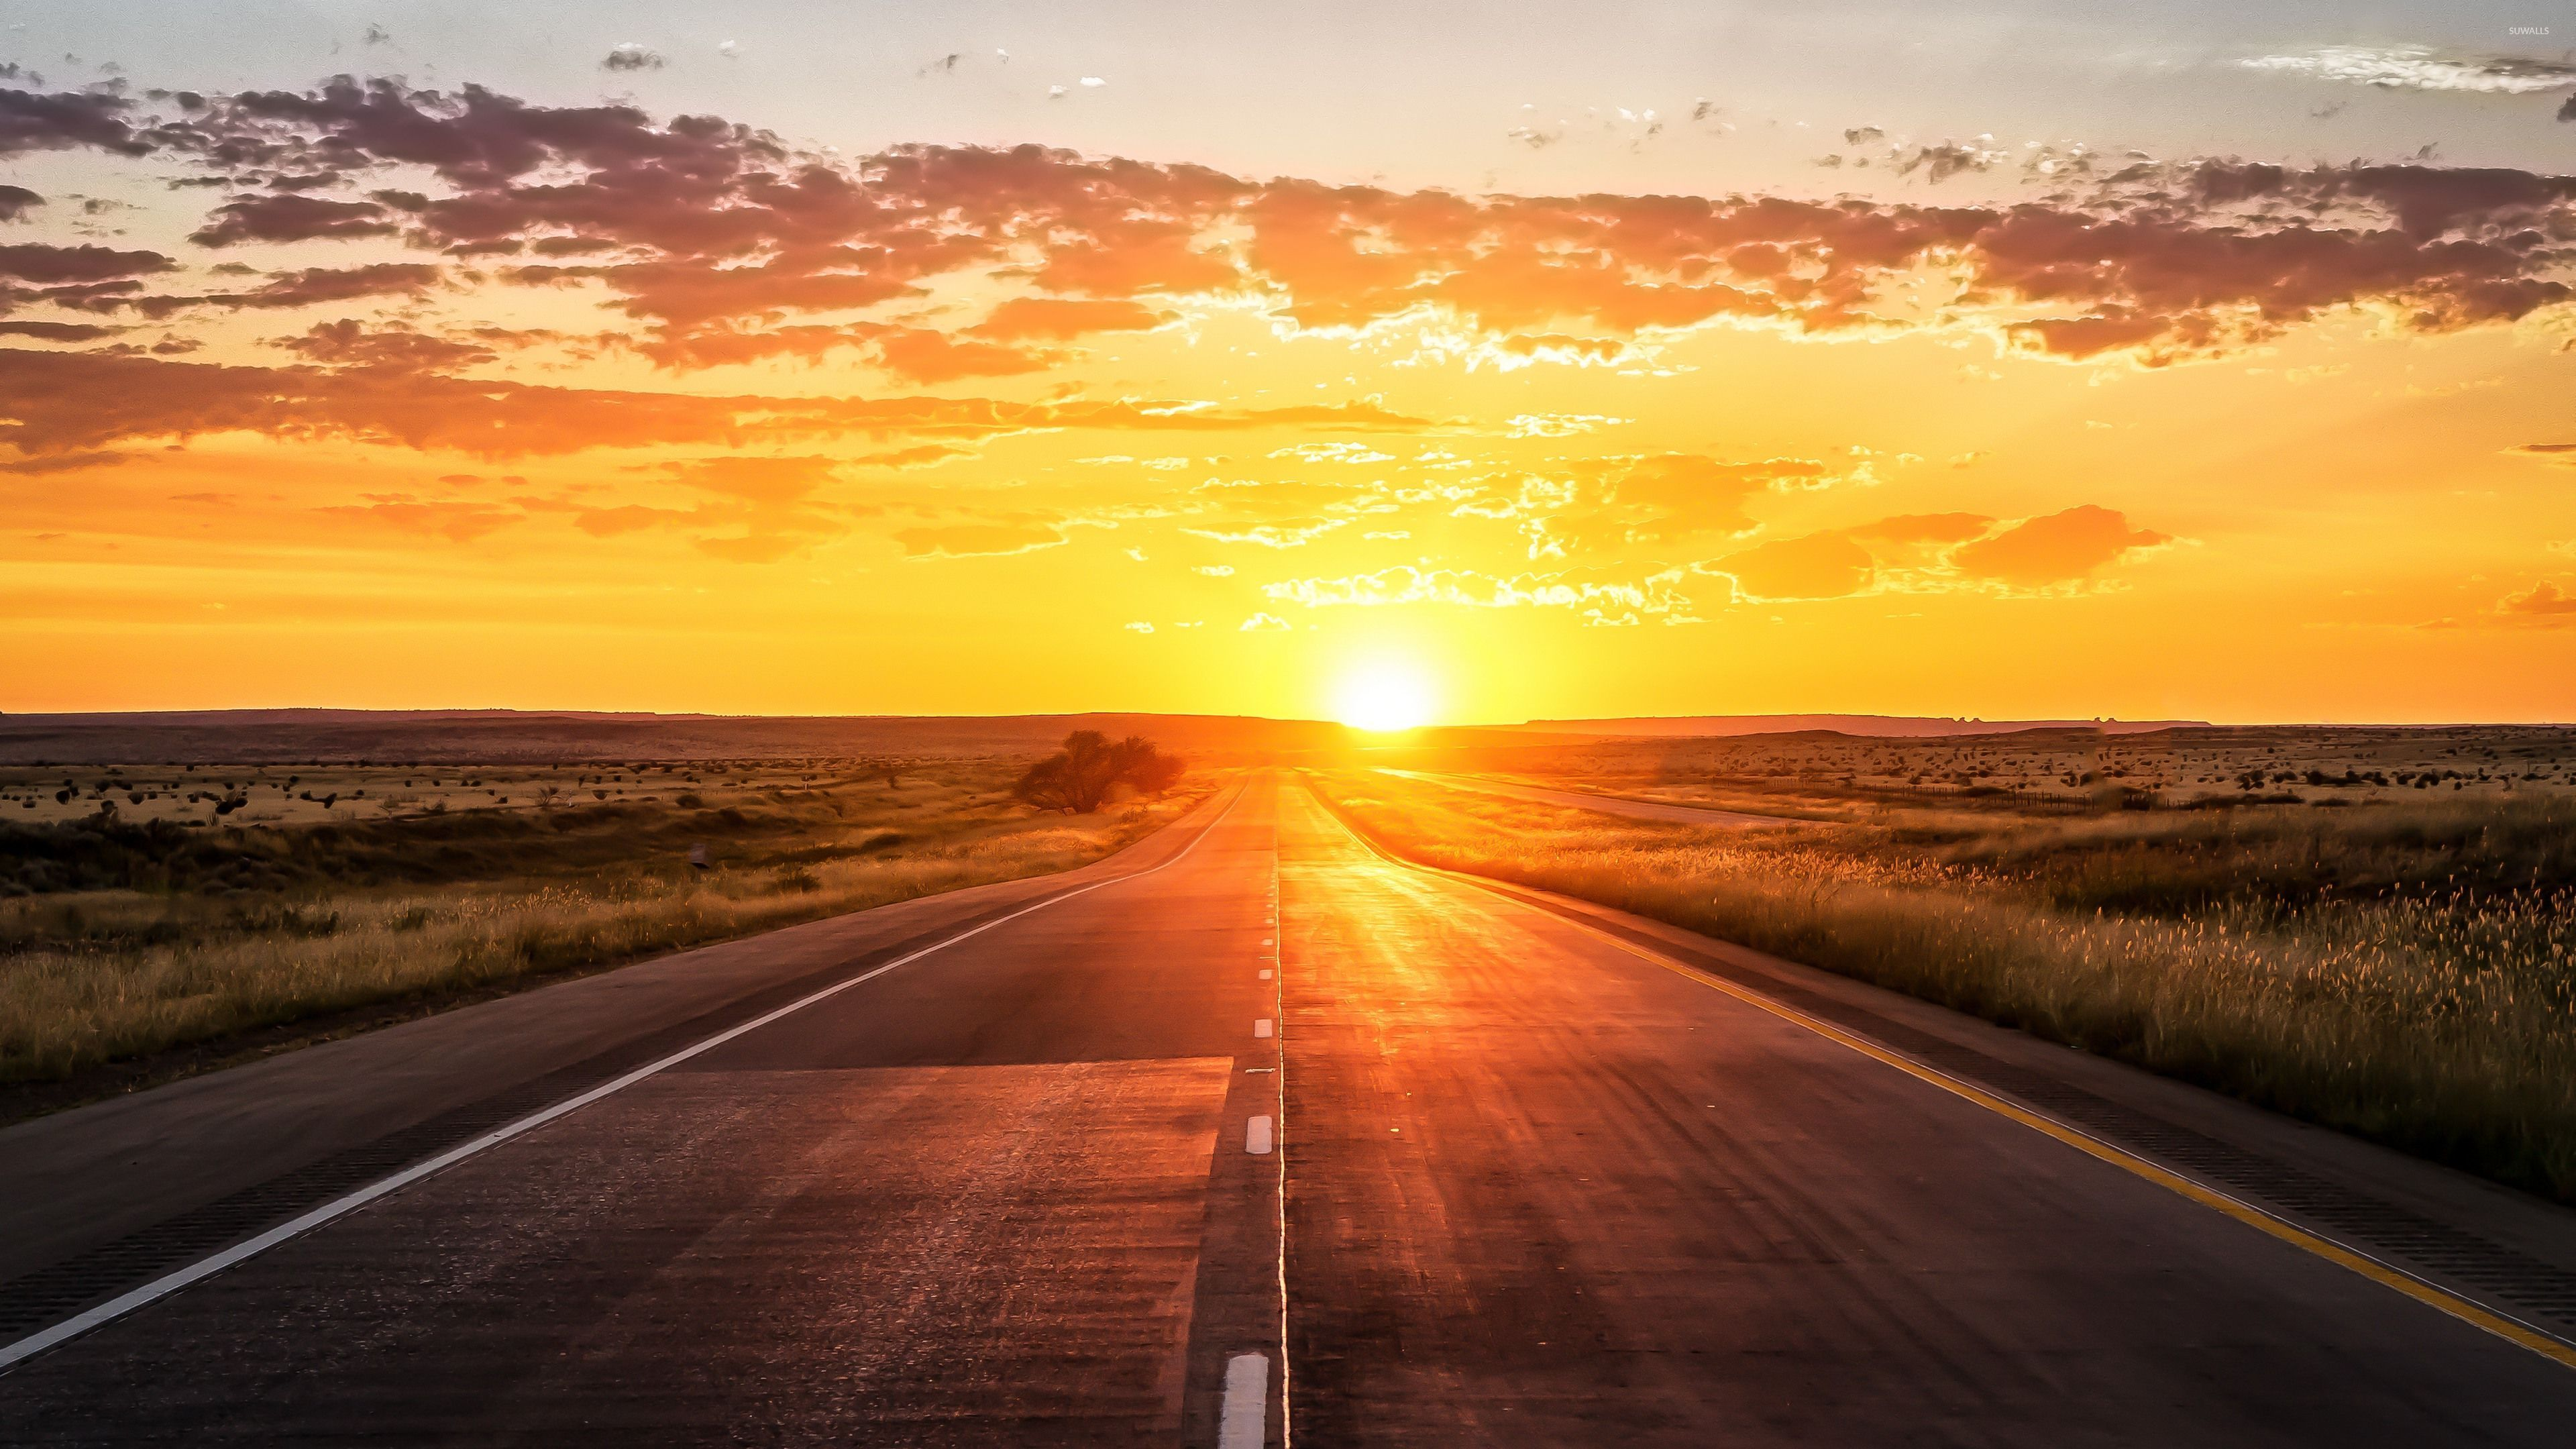 Bible Quotes Wallpaper Desktop Road Towards The Golden Sunset Wallpaper Nature